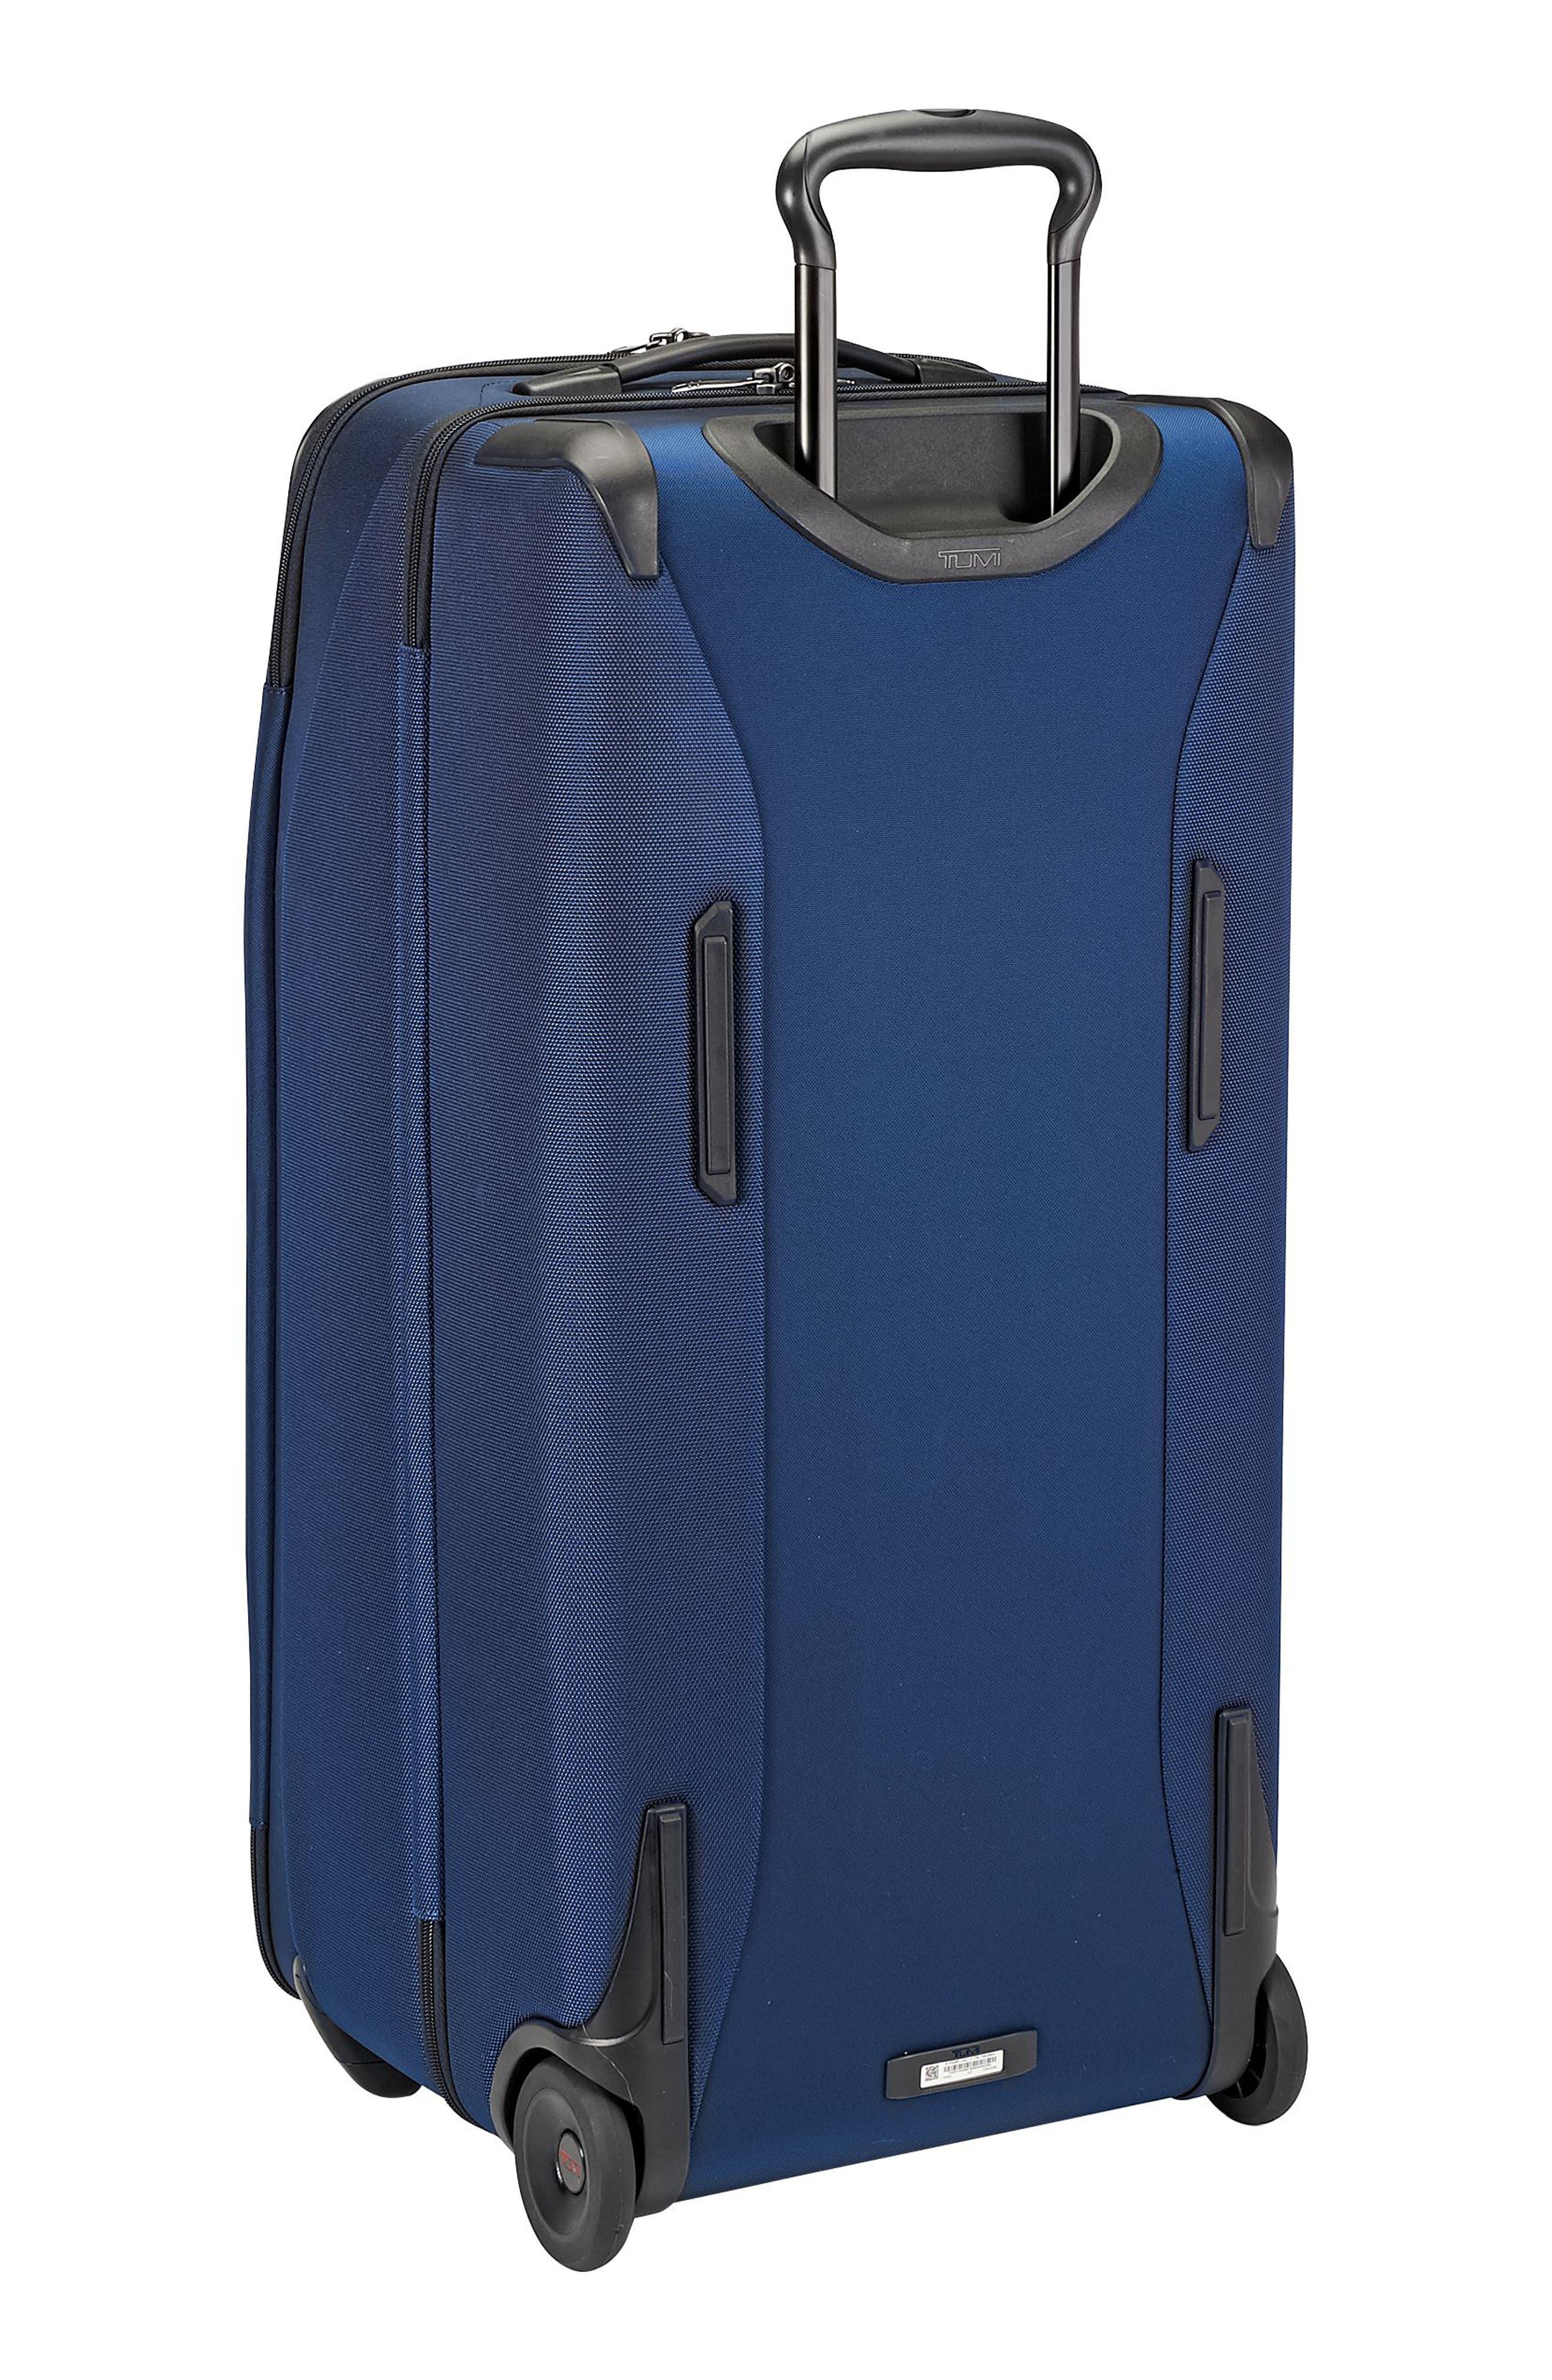 Merge - Rolling Duffel Bag,                             Alternate thumbnail 4, color,                             OCEAN BLUE